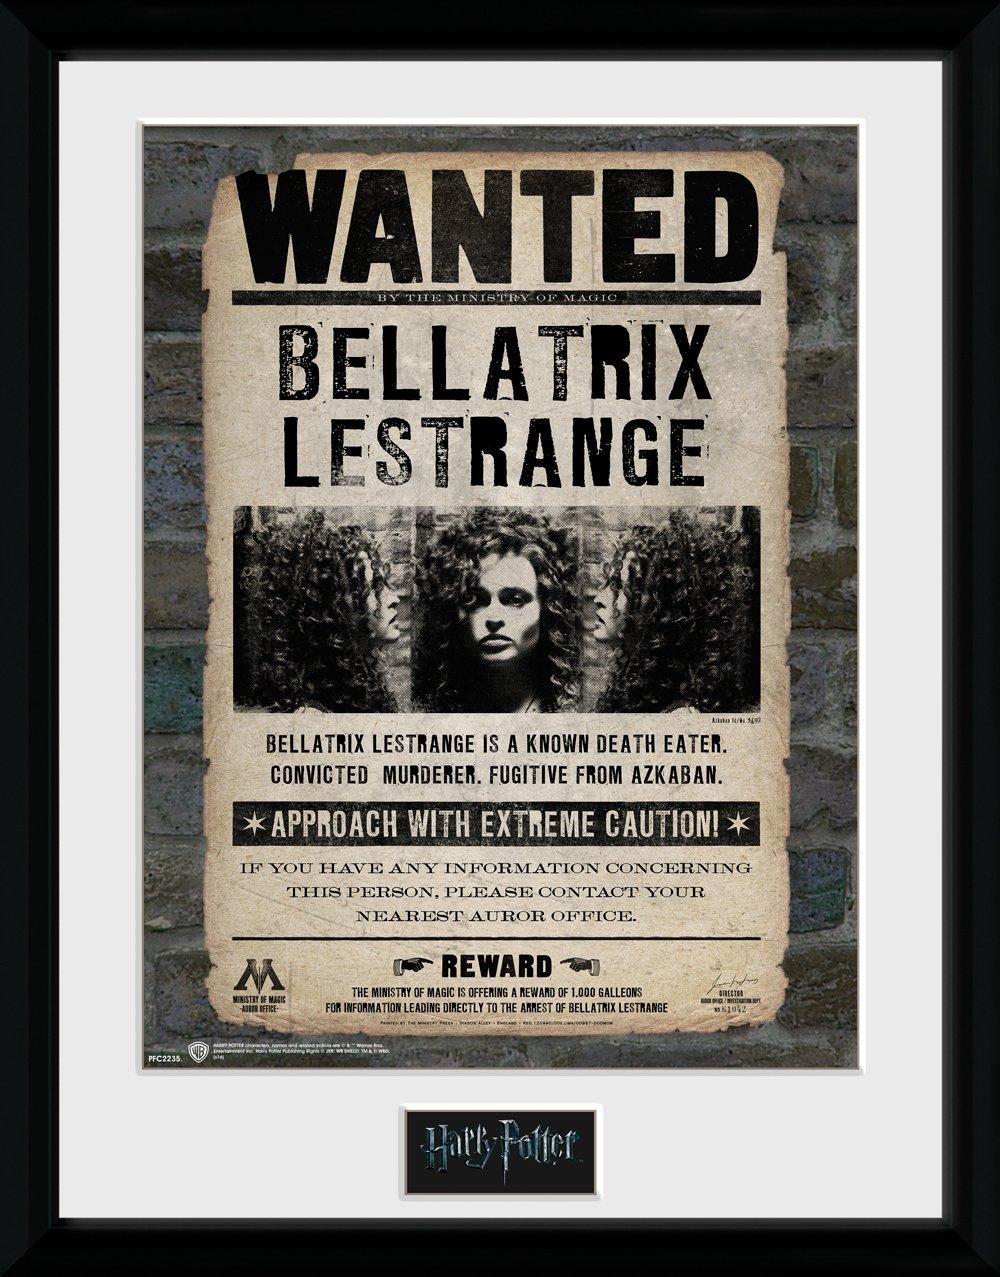 HARRY POTTER GB Eye Ltd Bellatrix Foto incorniciata 30 x 40 cm